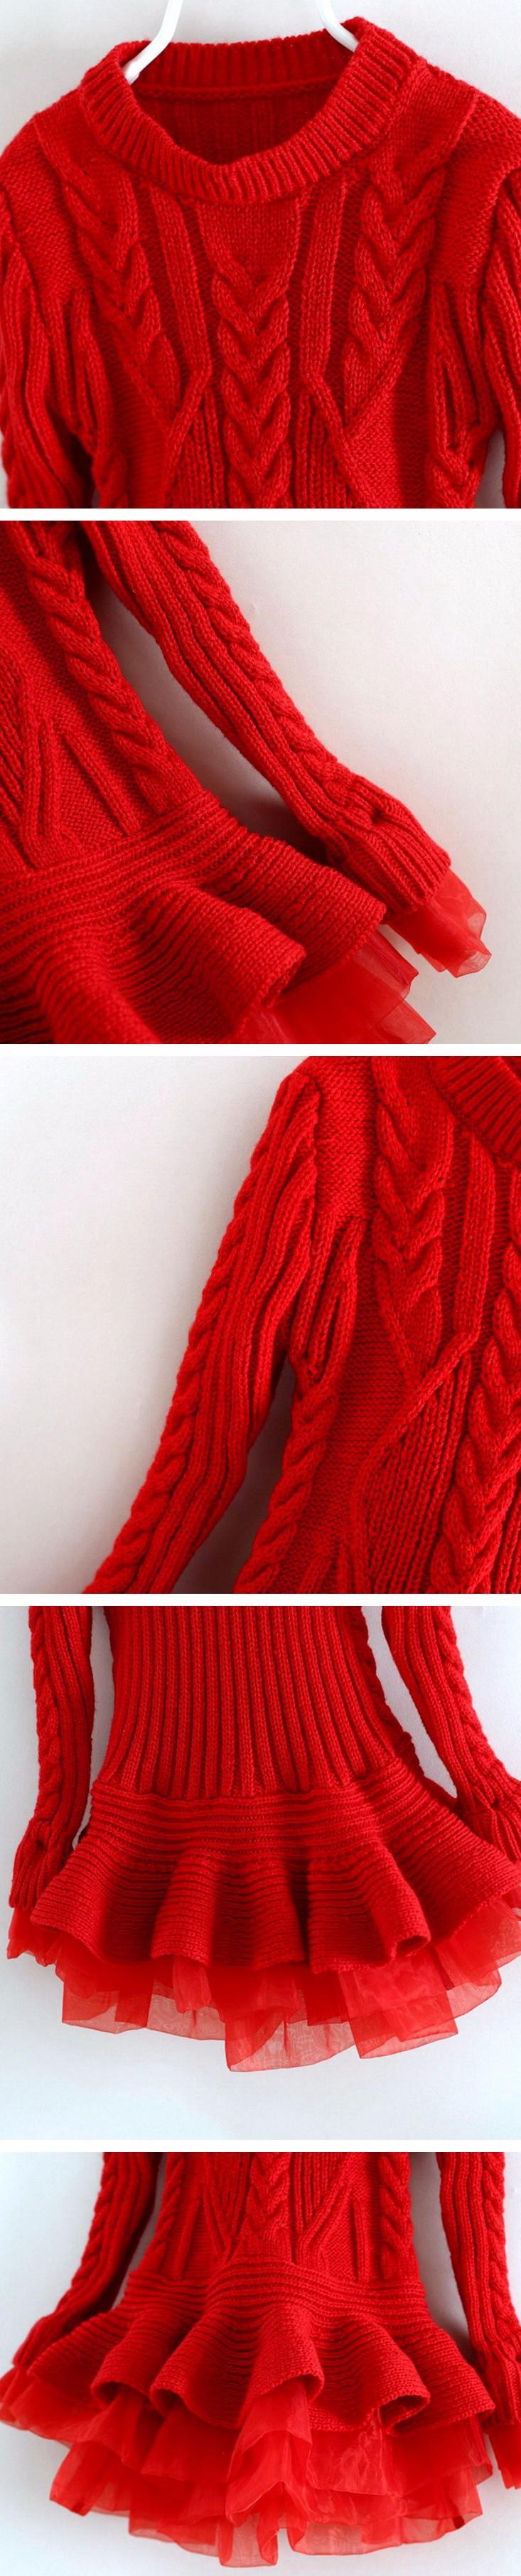 f13998afc 2016 New Baby Girls Christmas sweater Dress Costume children warm ...